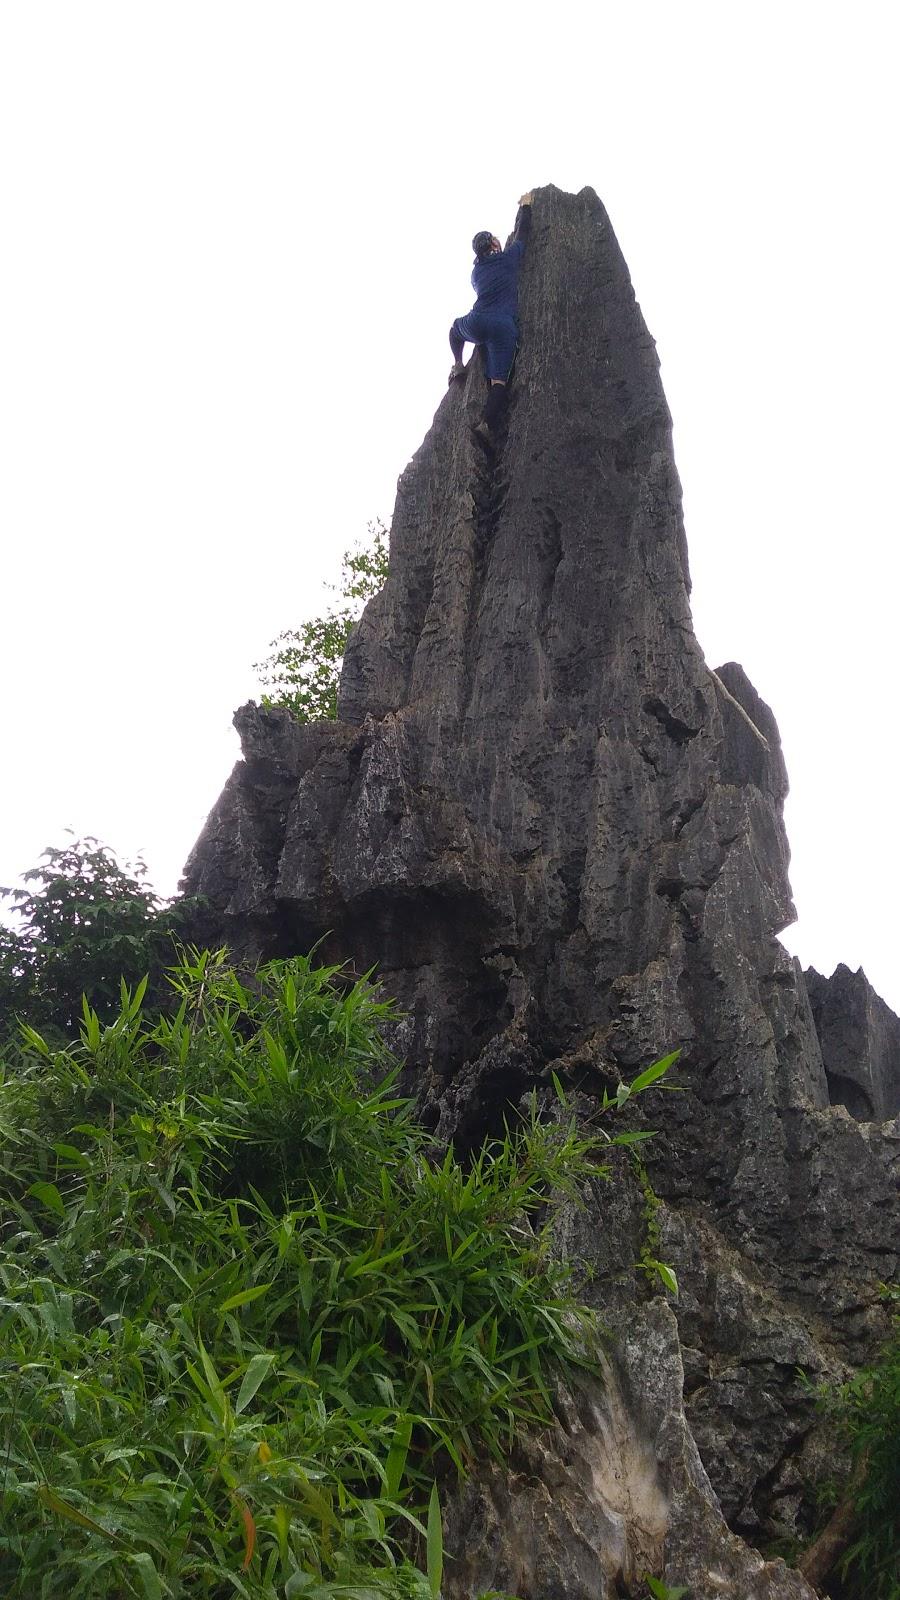 Bp Near Me >> The Novice Trekker: Mascap MultiPeak Hike - Espadang Bato ...